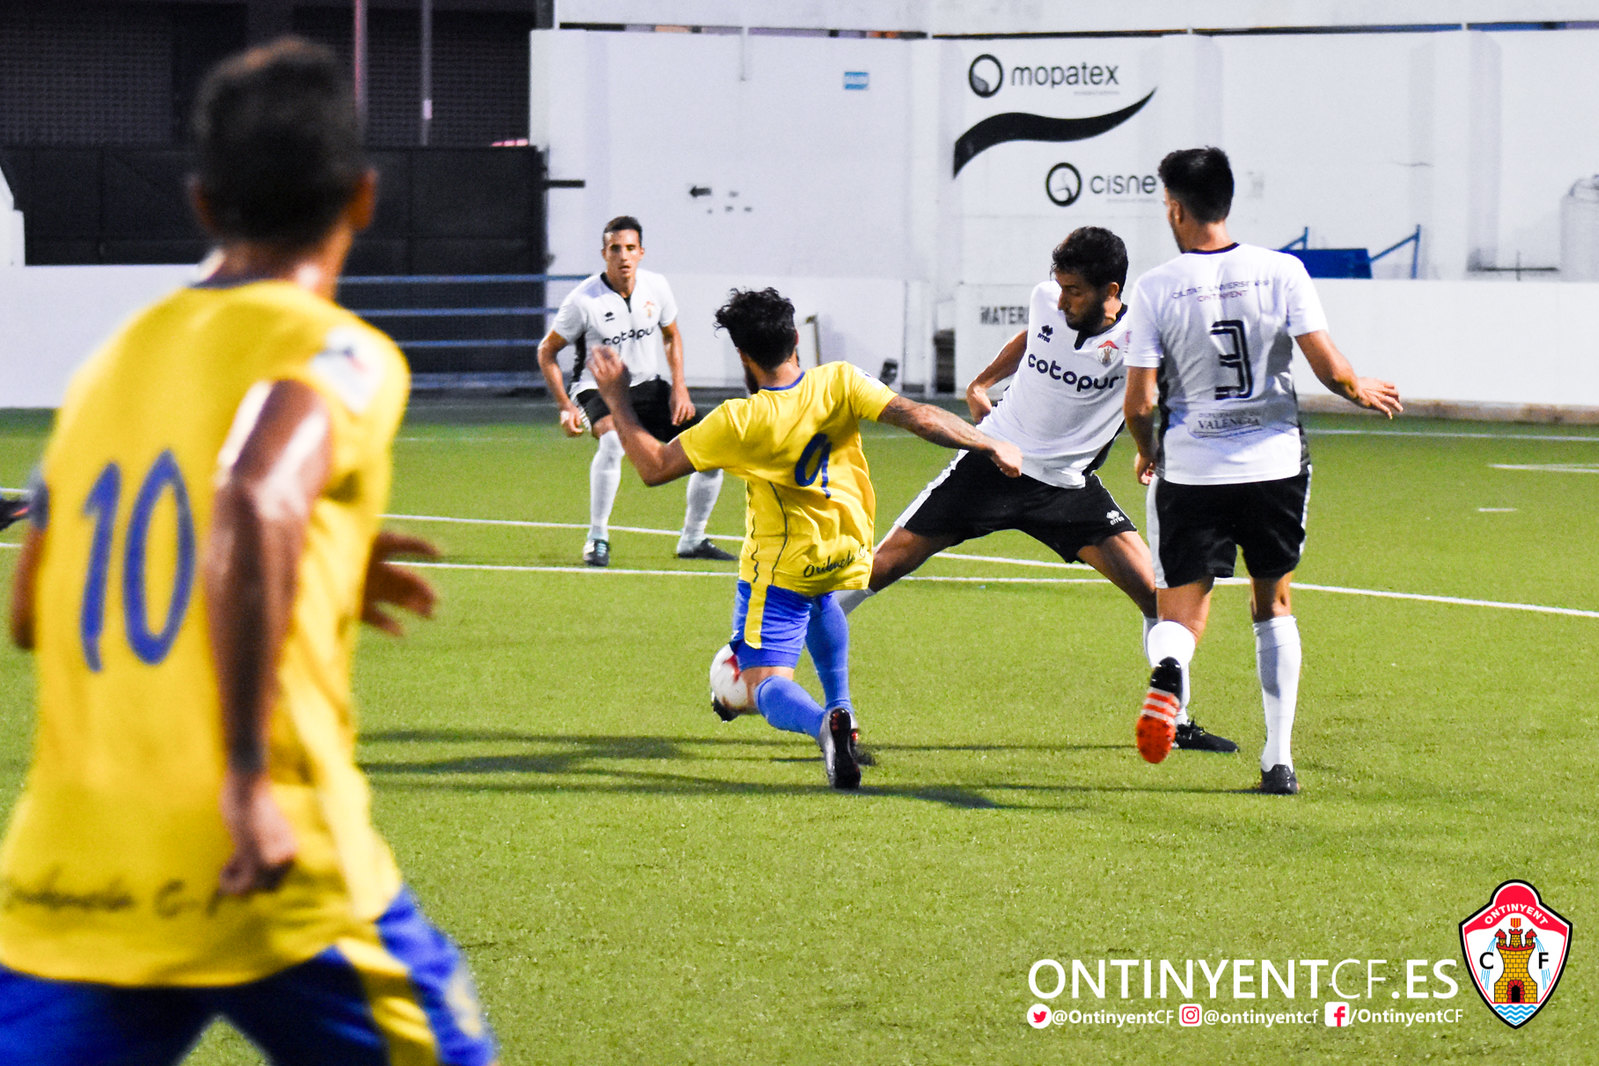 Ontinyent CF Carrasco